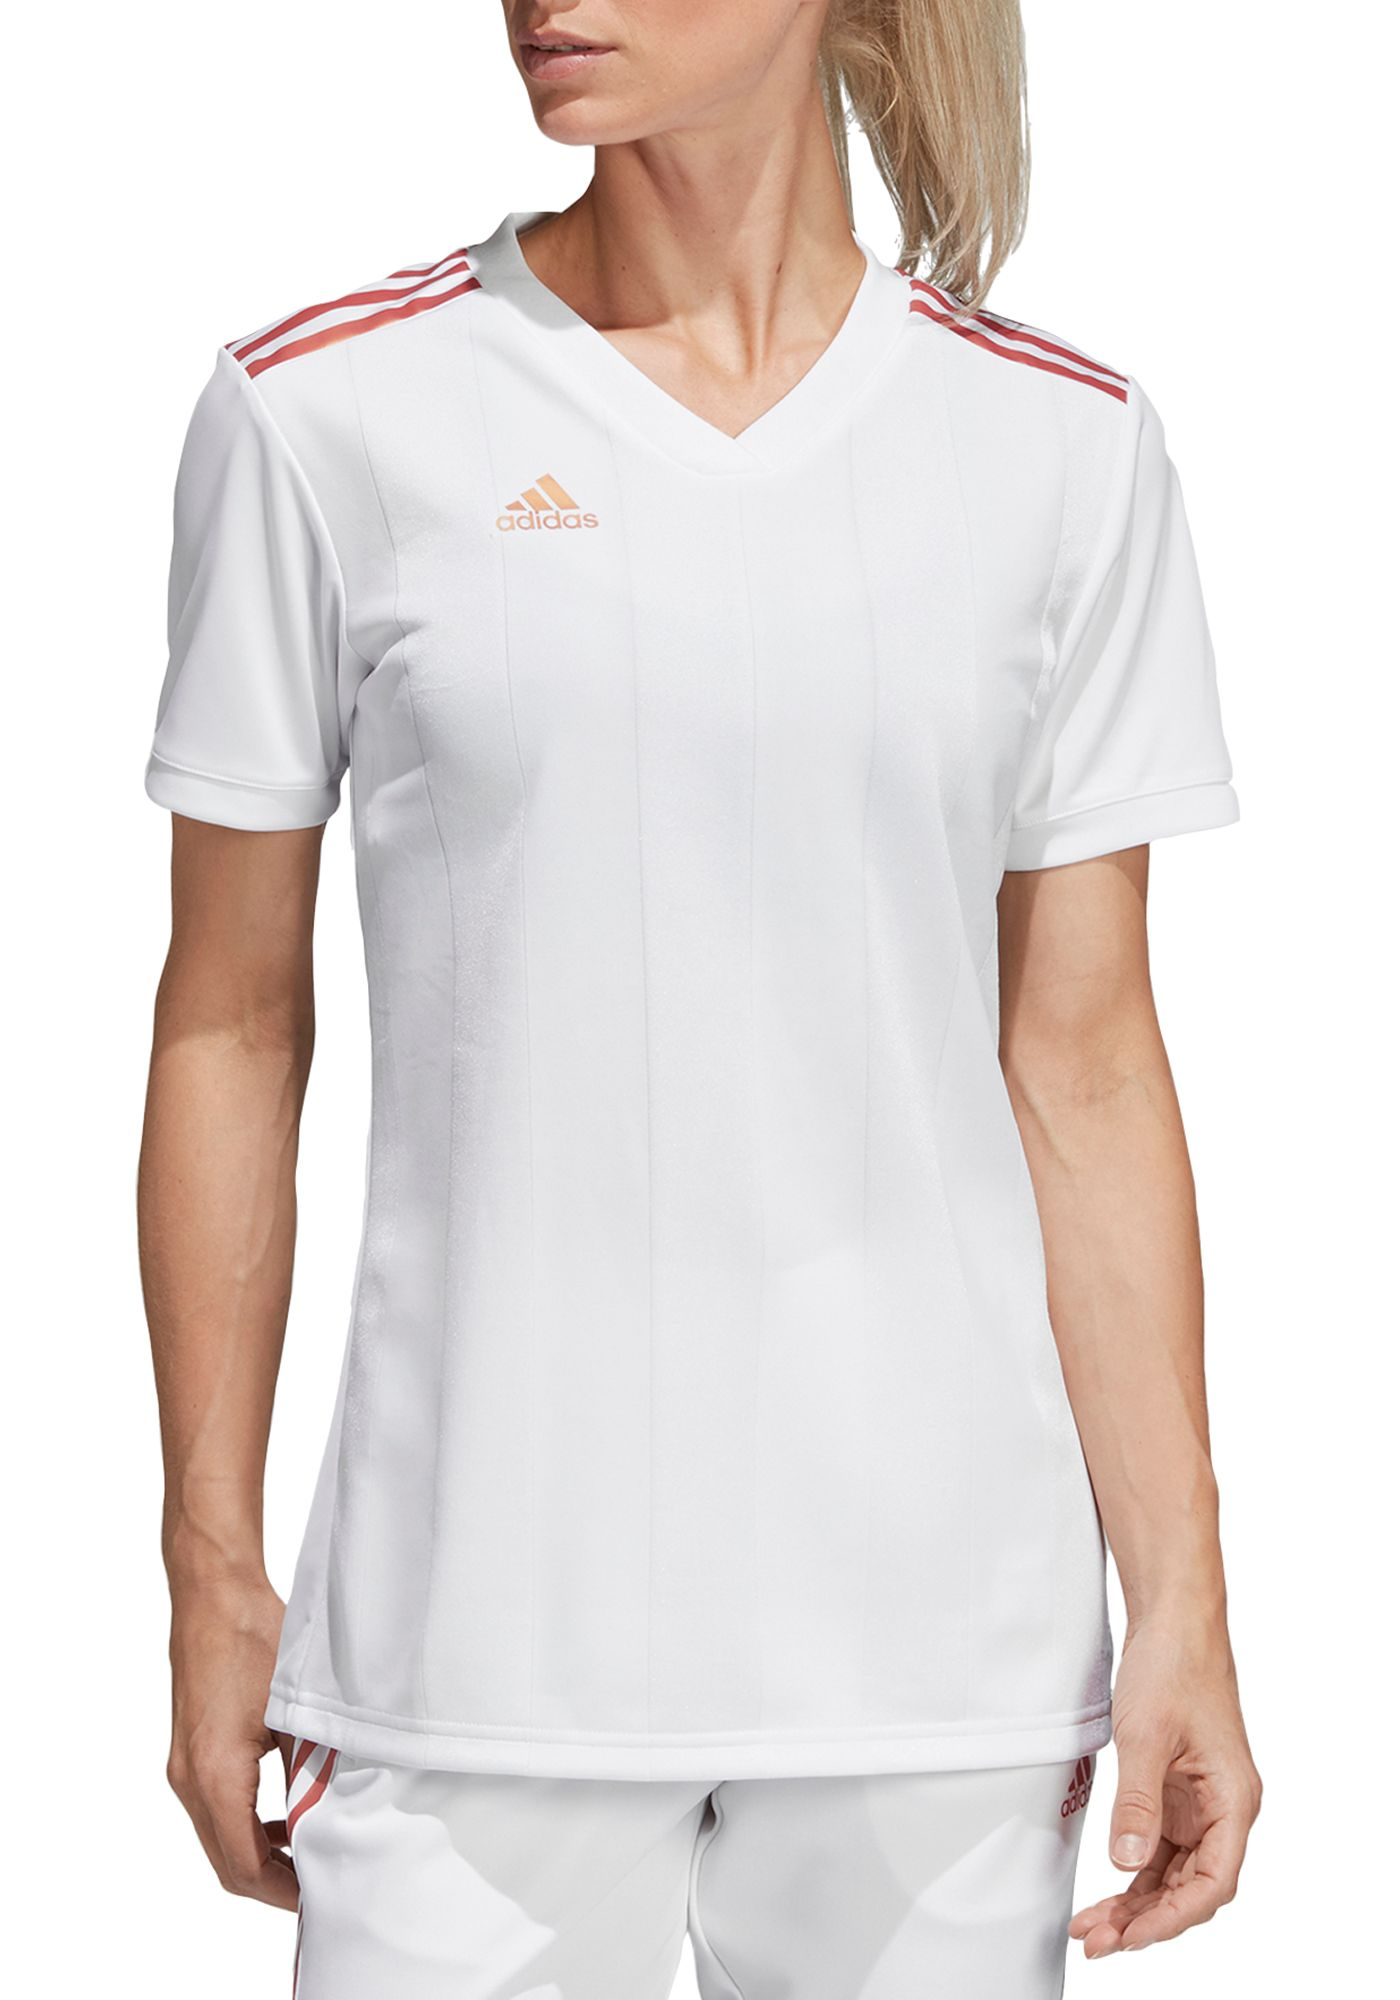 adidas Women's Pearl Tiro Soccer Jersey